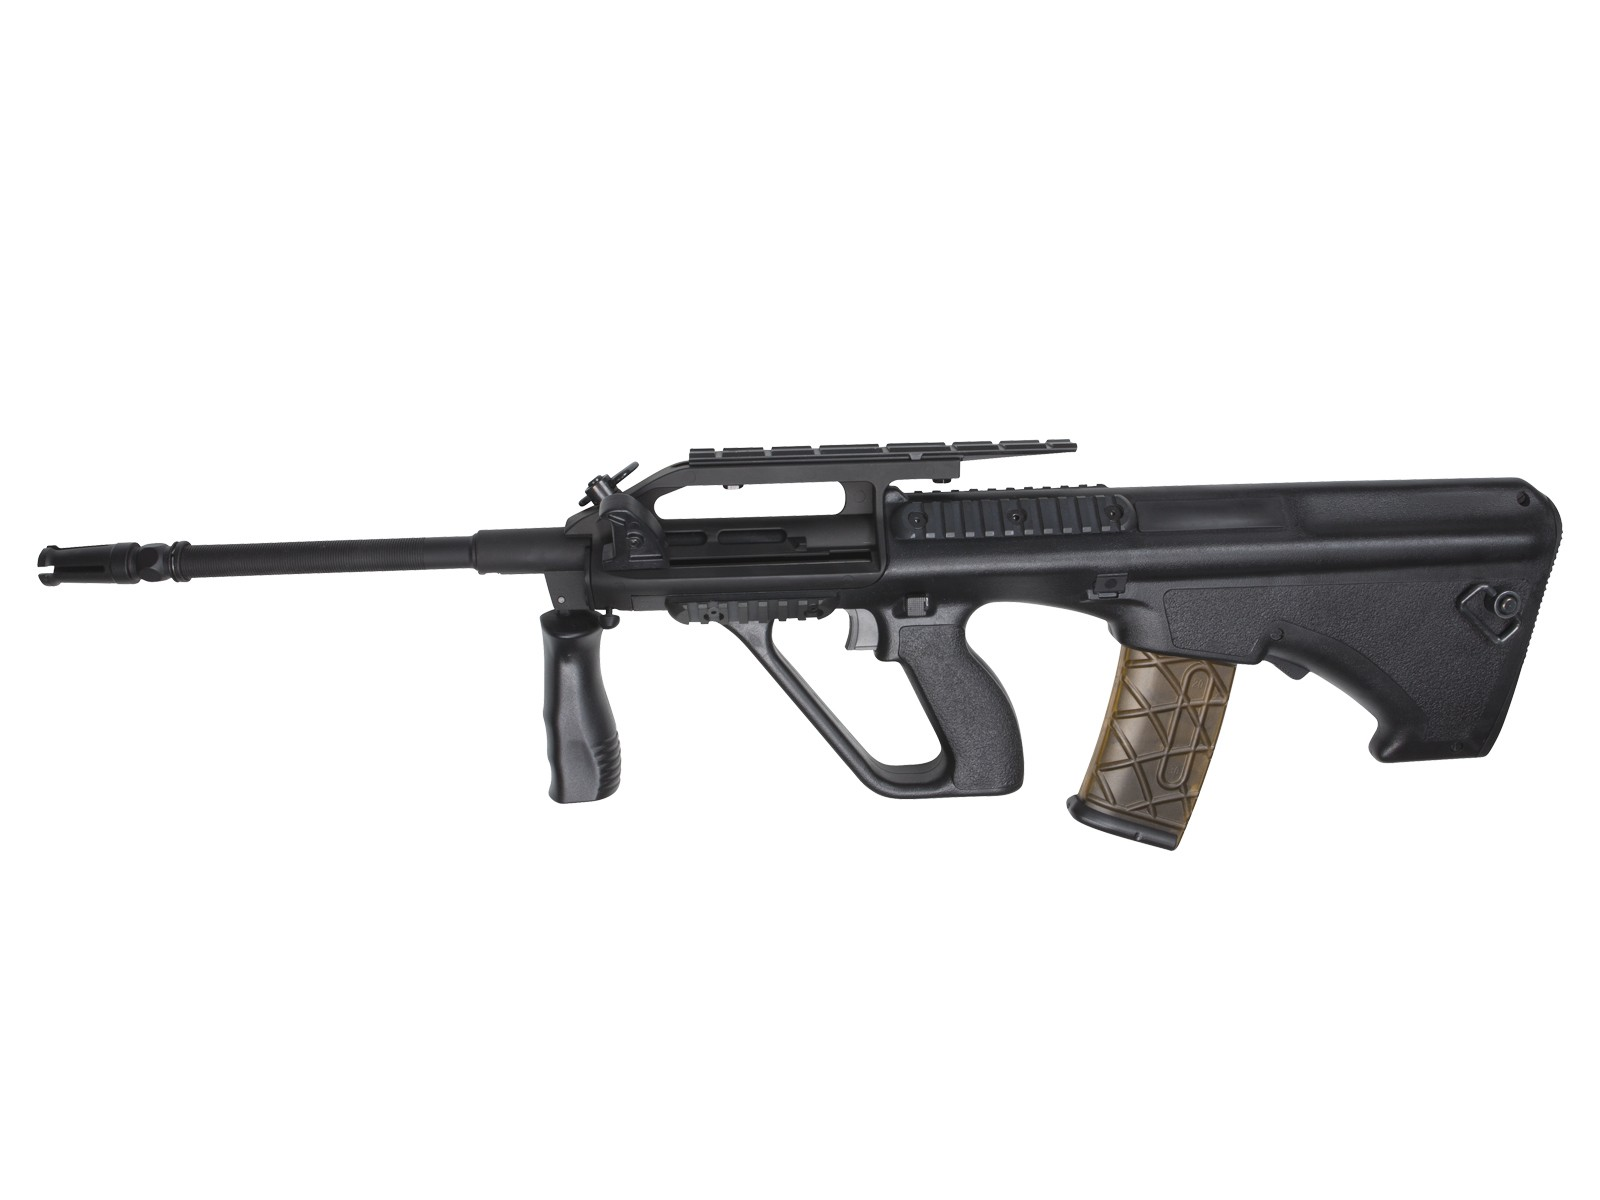 ASG - Fusil d'assaut Steyr Aug A1 ProLine  - AEG (1.1 joules)